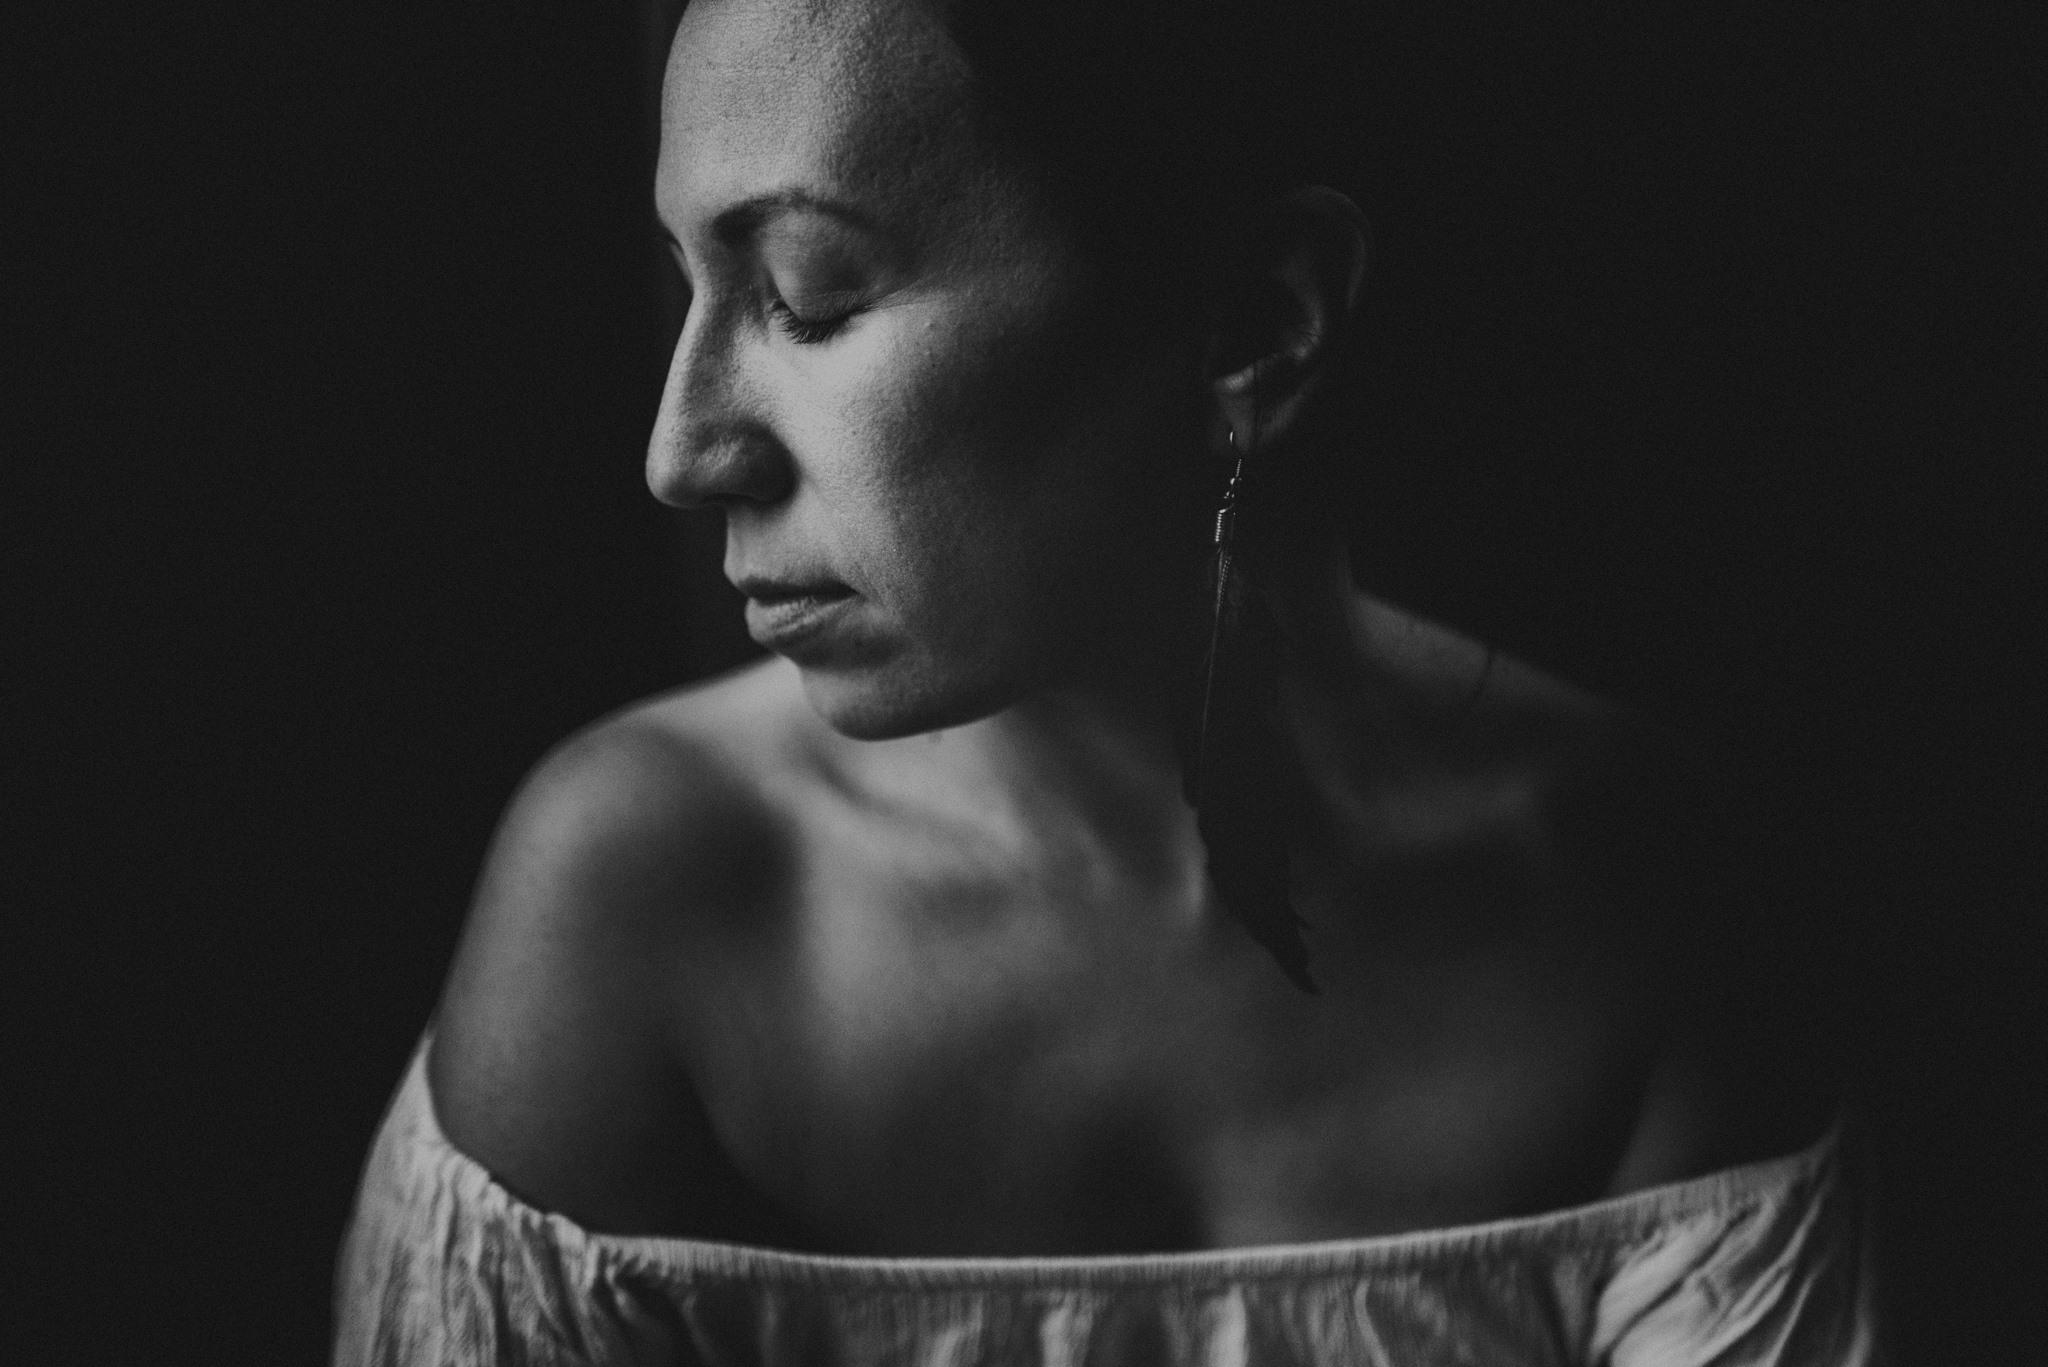 Gina Santellano